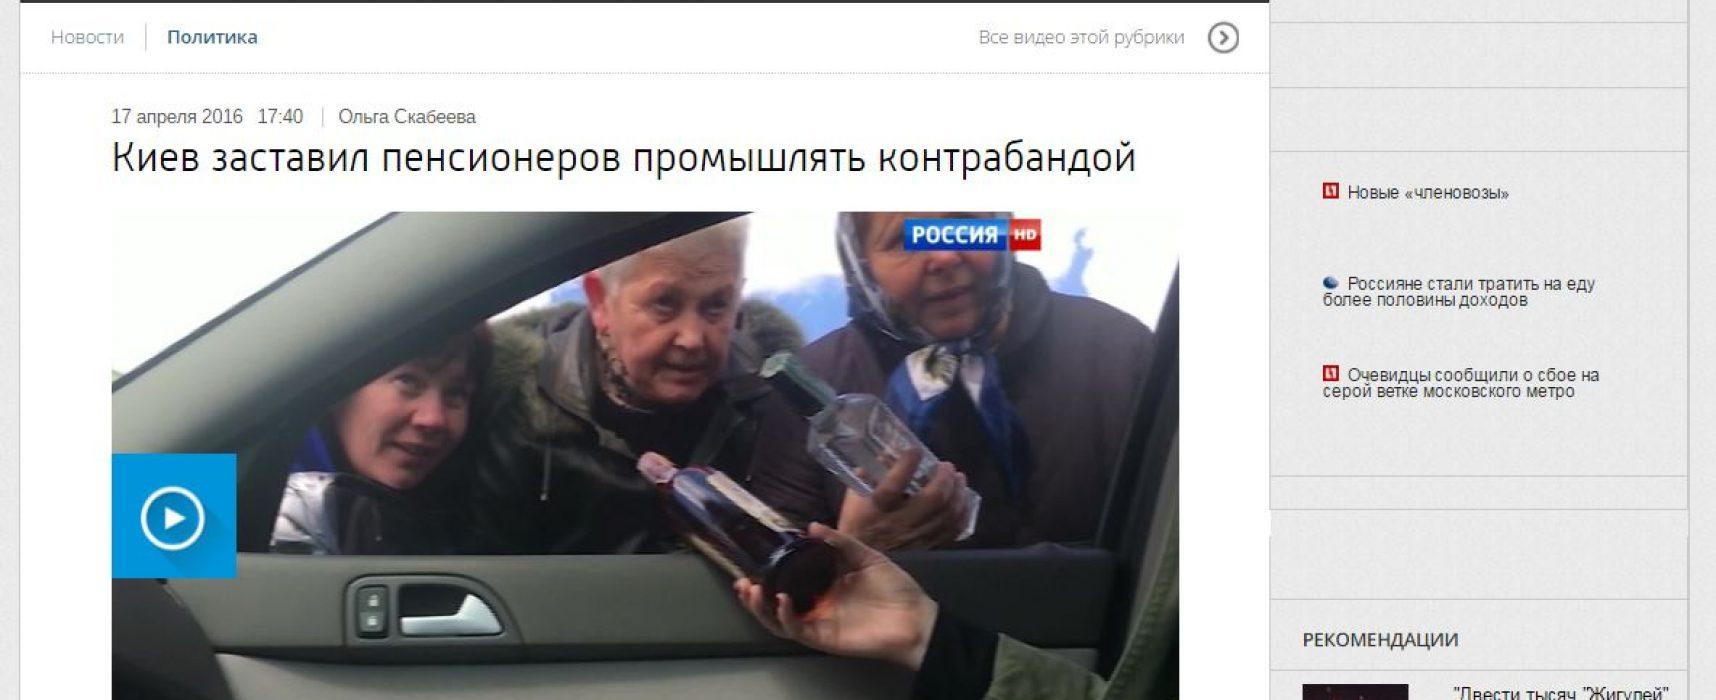 Fake: Oekraïners in Polen: schoonmakers en afwassers